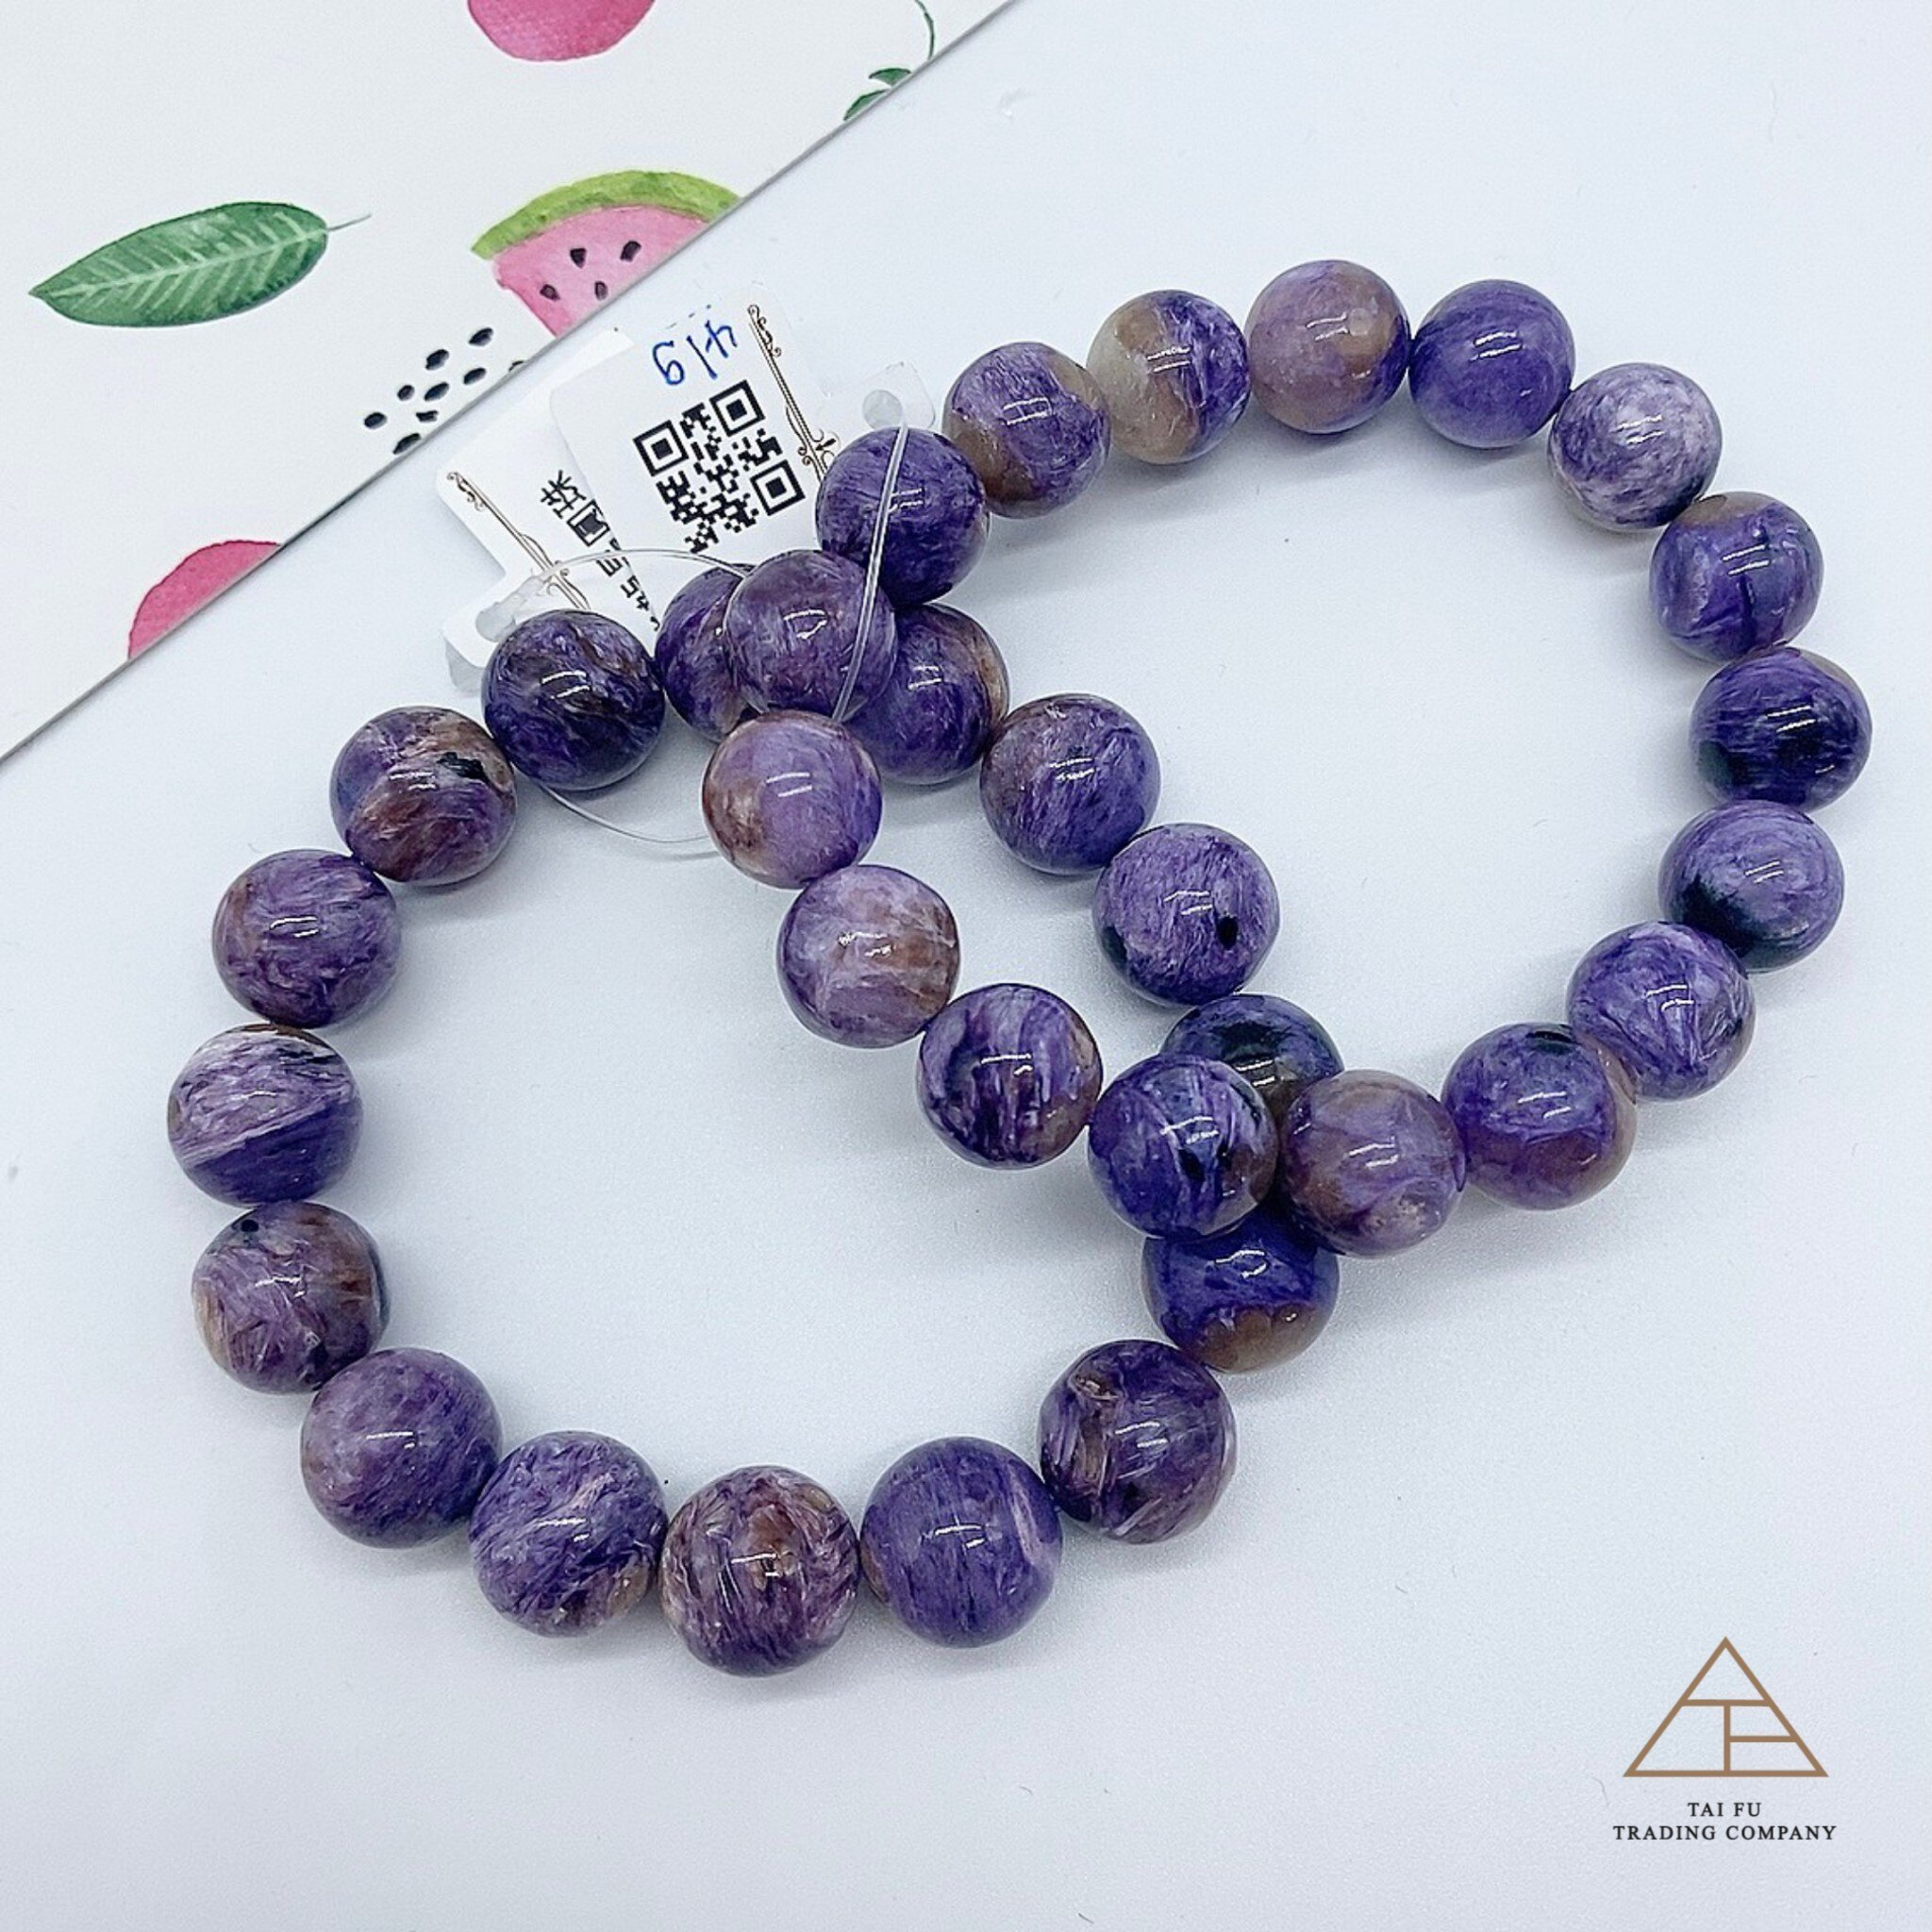 Tai Fu◆紫龍晶手珠|水晶|手鍊|紫龍晶|療癒|能量|天蠍|射手|雙魚|頂輪|天然水晶